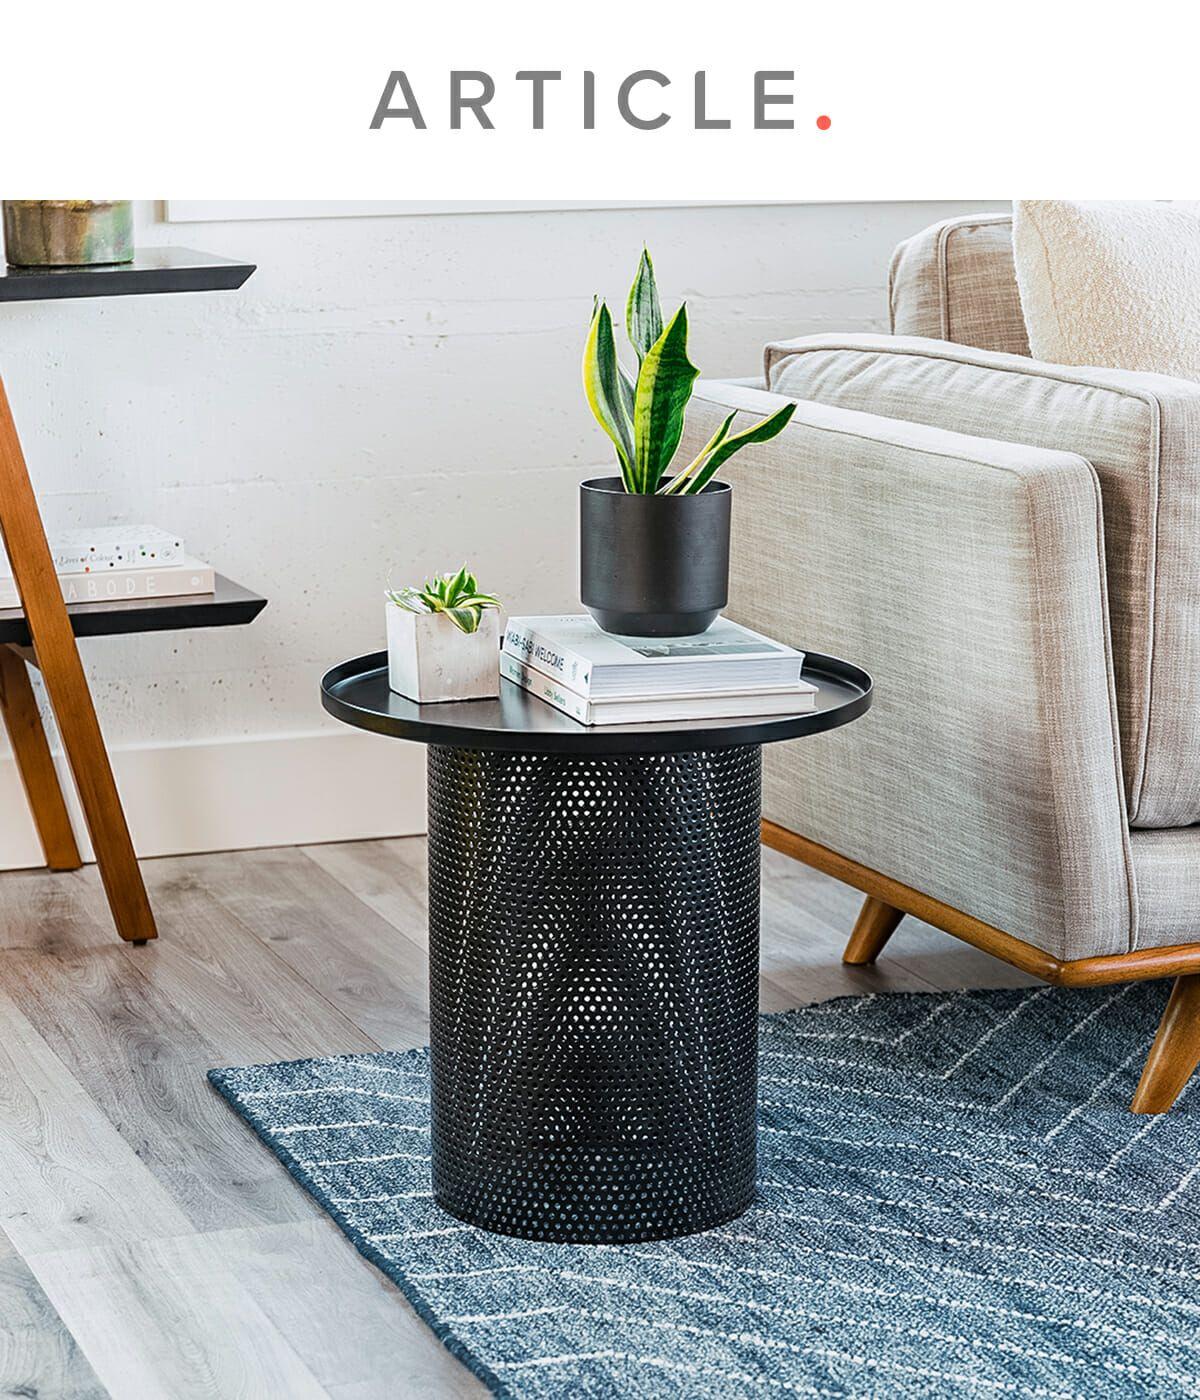 Equa Black Side Table In 2021 Living Room Decor Cozy Black Side Table Table